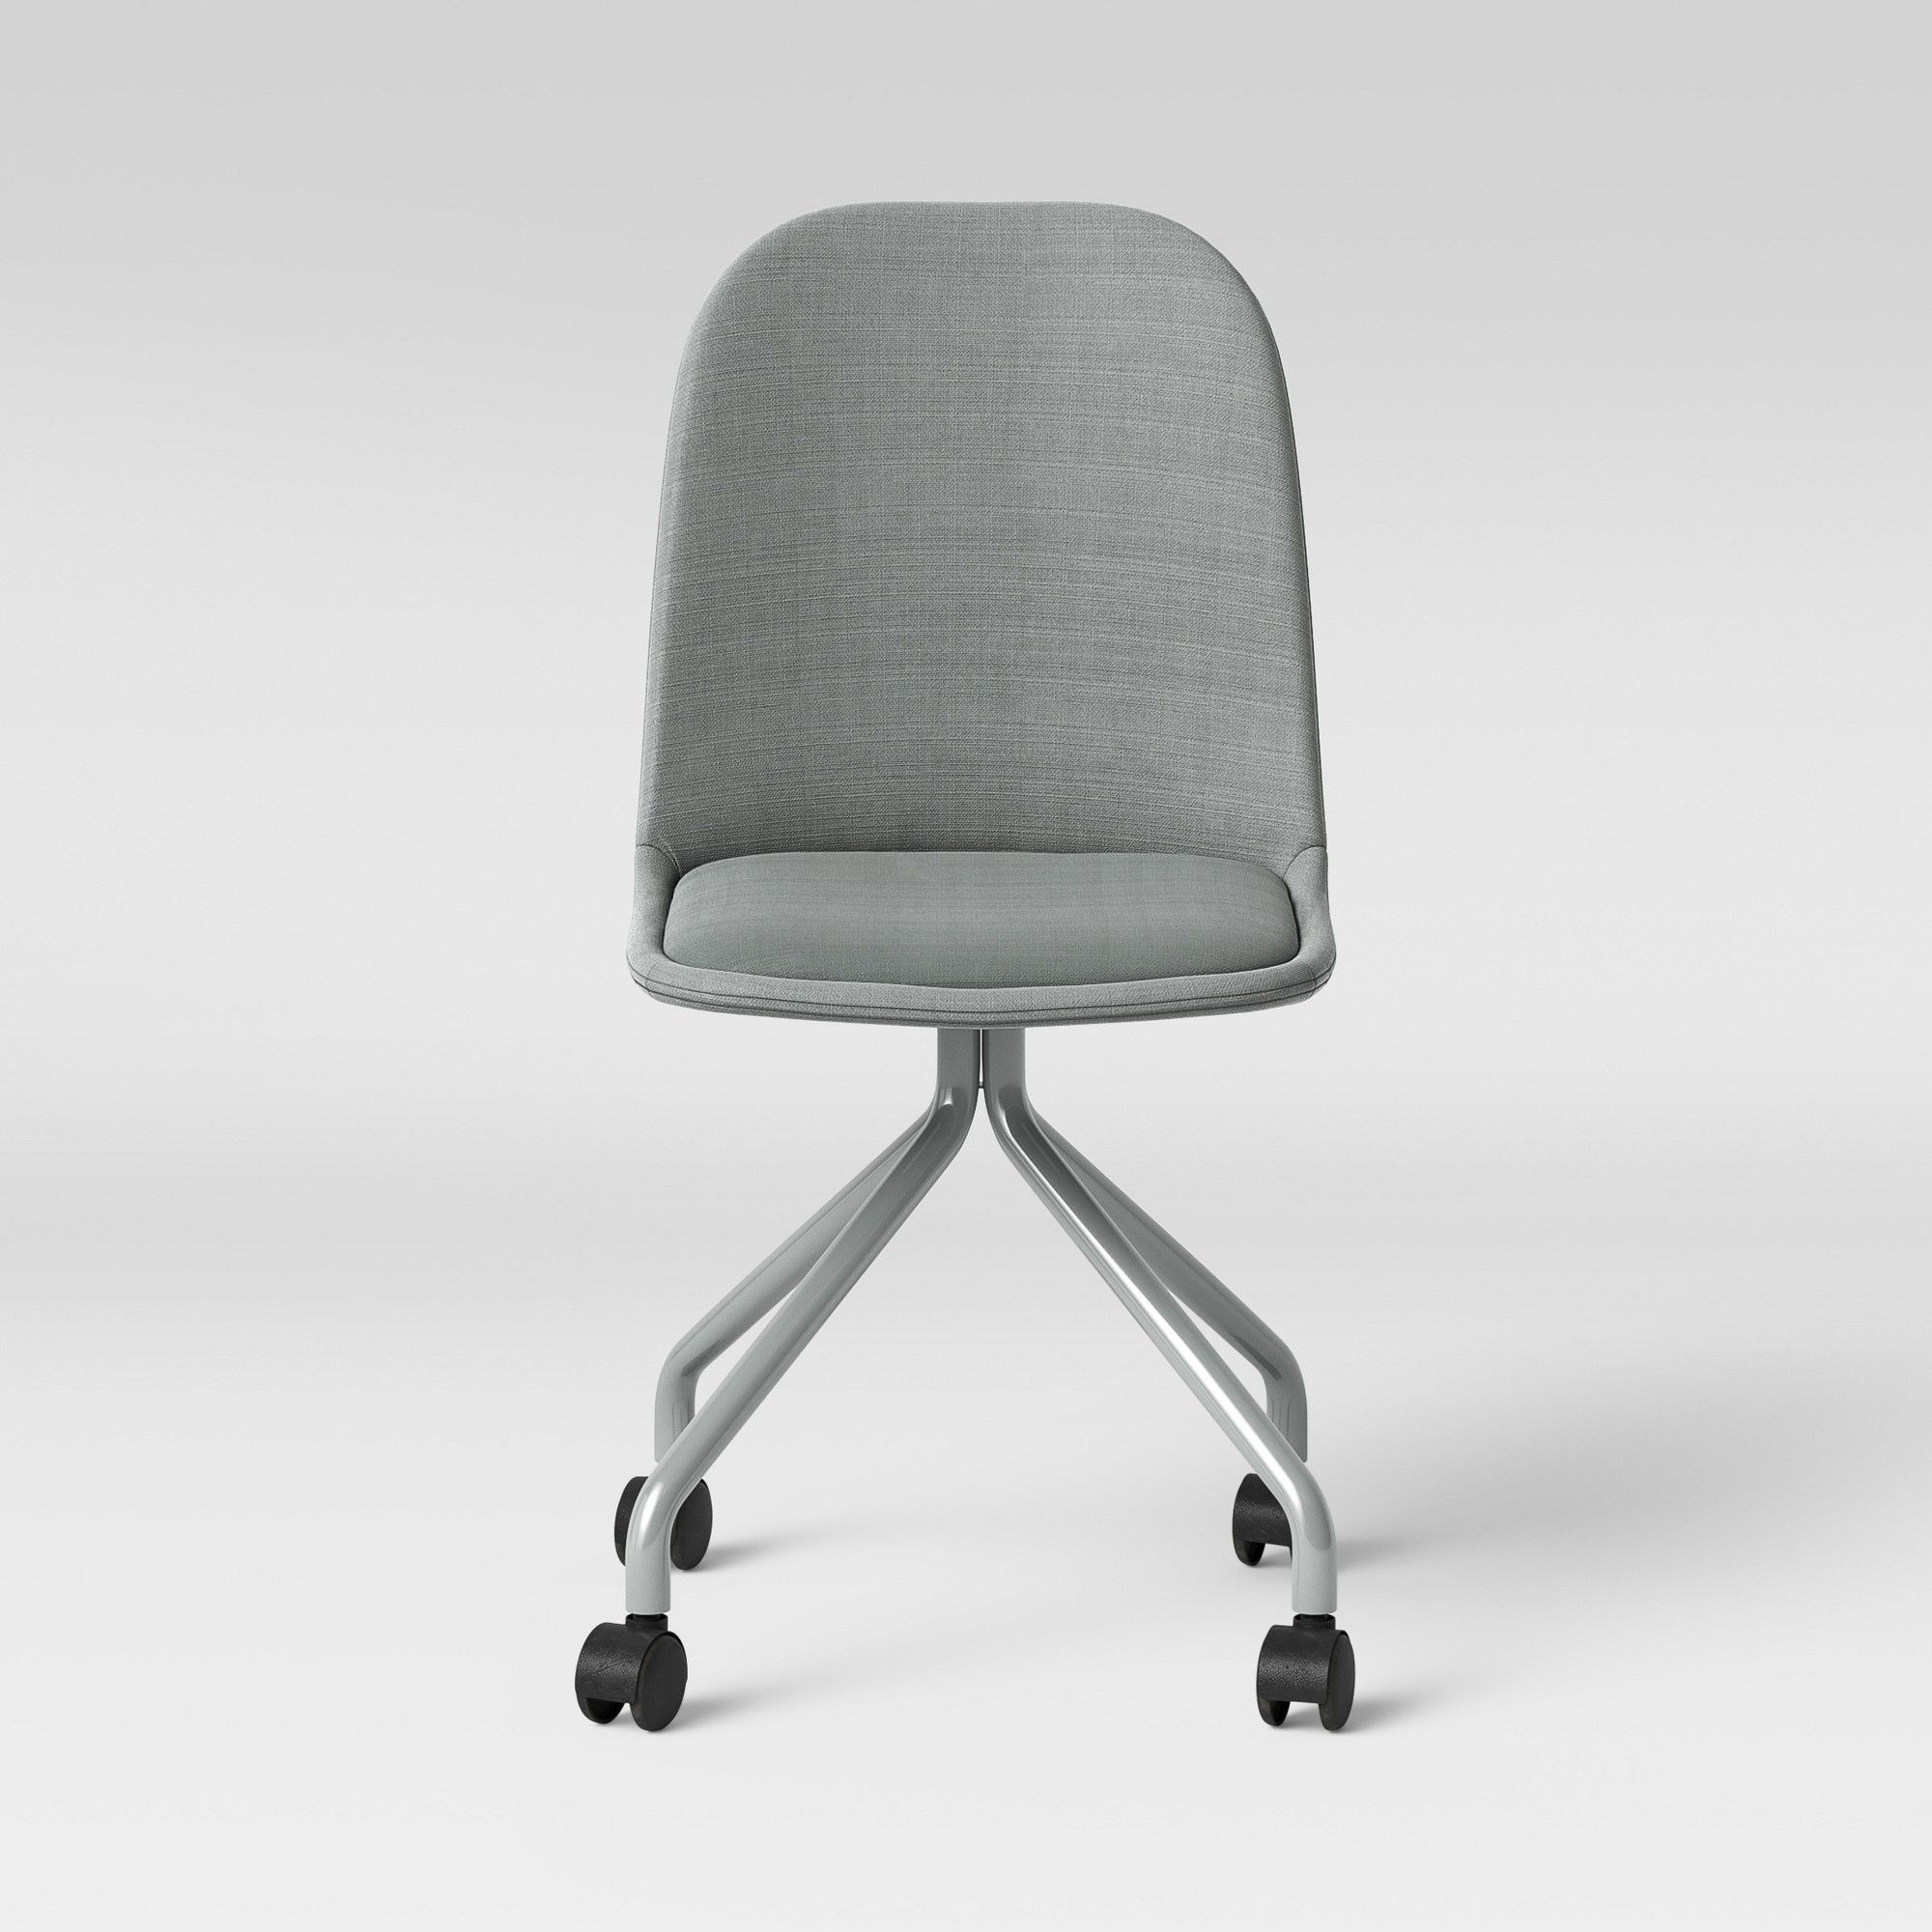 Fantastic Kids Rolling Desk Chair Gray Pillowfort Grey Desk Chair Pabps2019 Chair Design Images Pabps2019Com